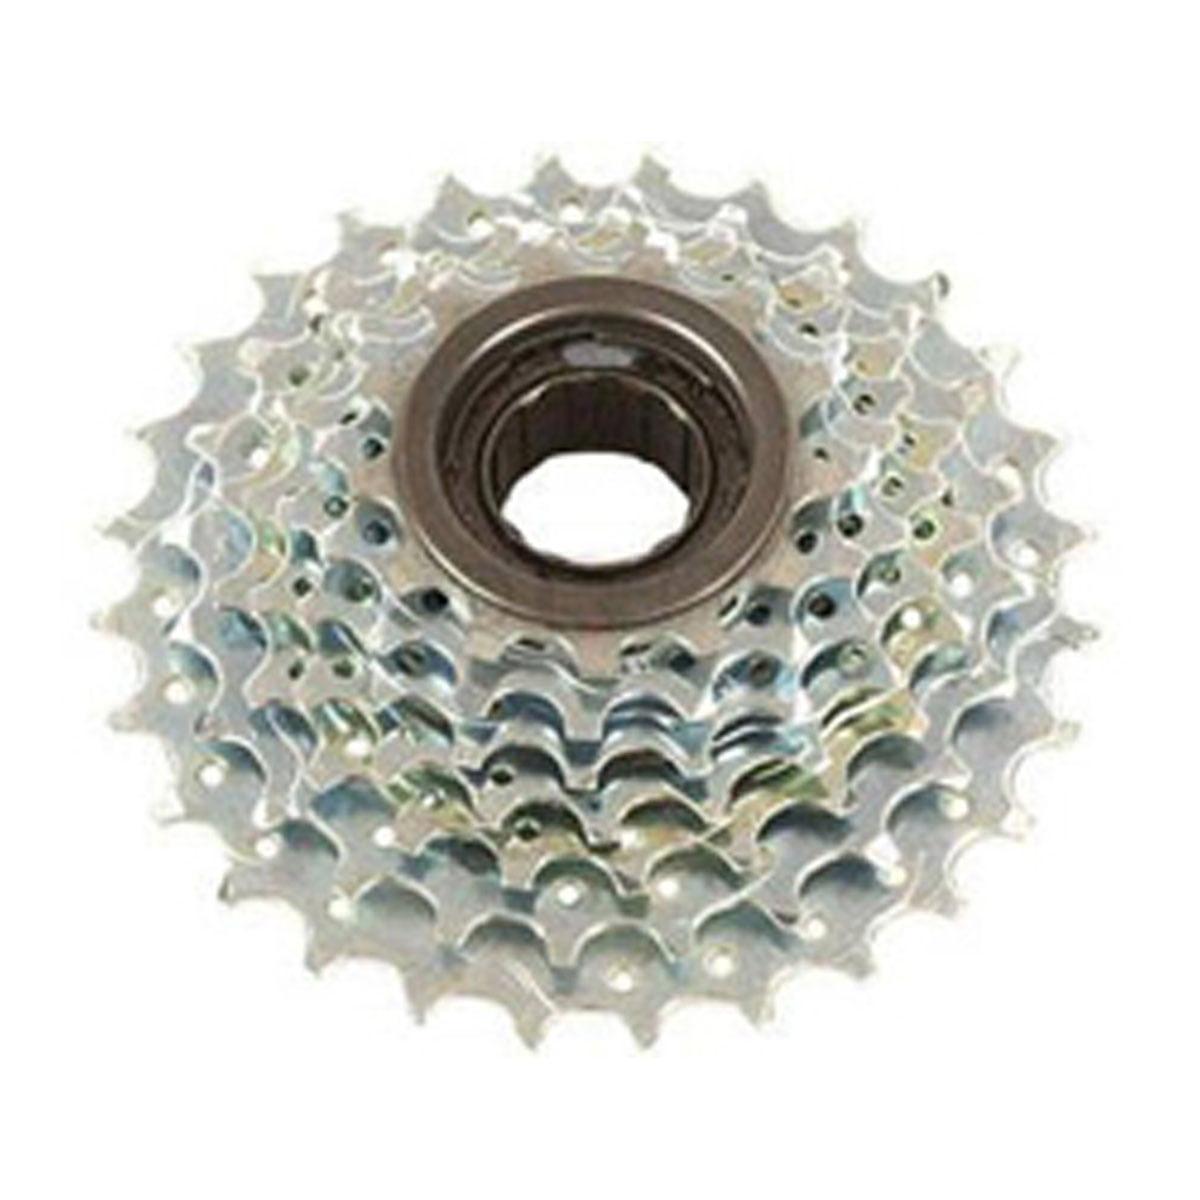 SunRace 7 Freewheel 13-28T HG - 327-184